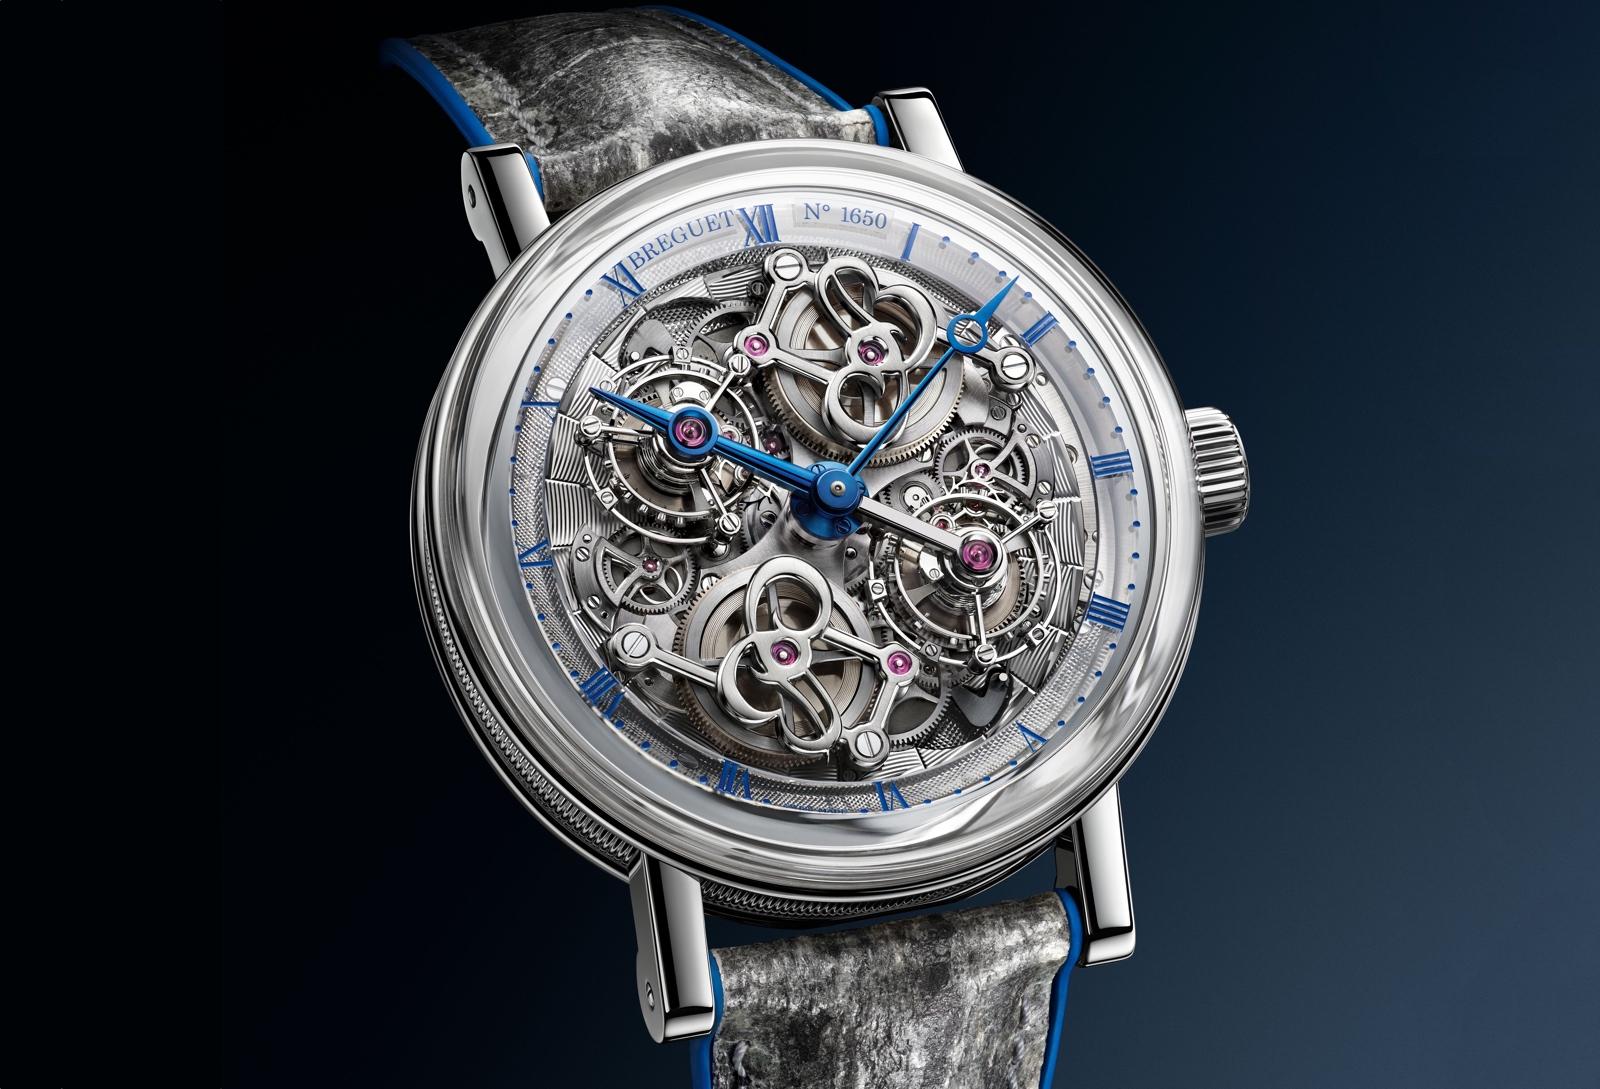 Breguet Classique Double Tourbillon Quai de l'Horloge 5345PT - front